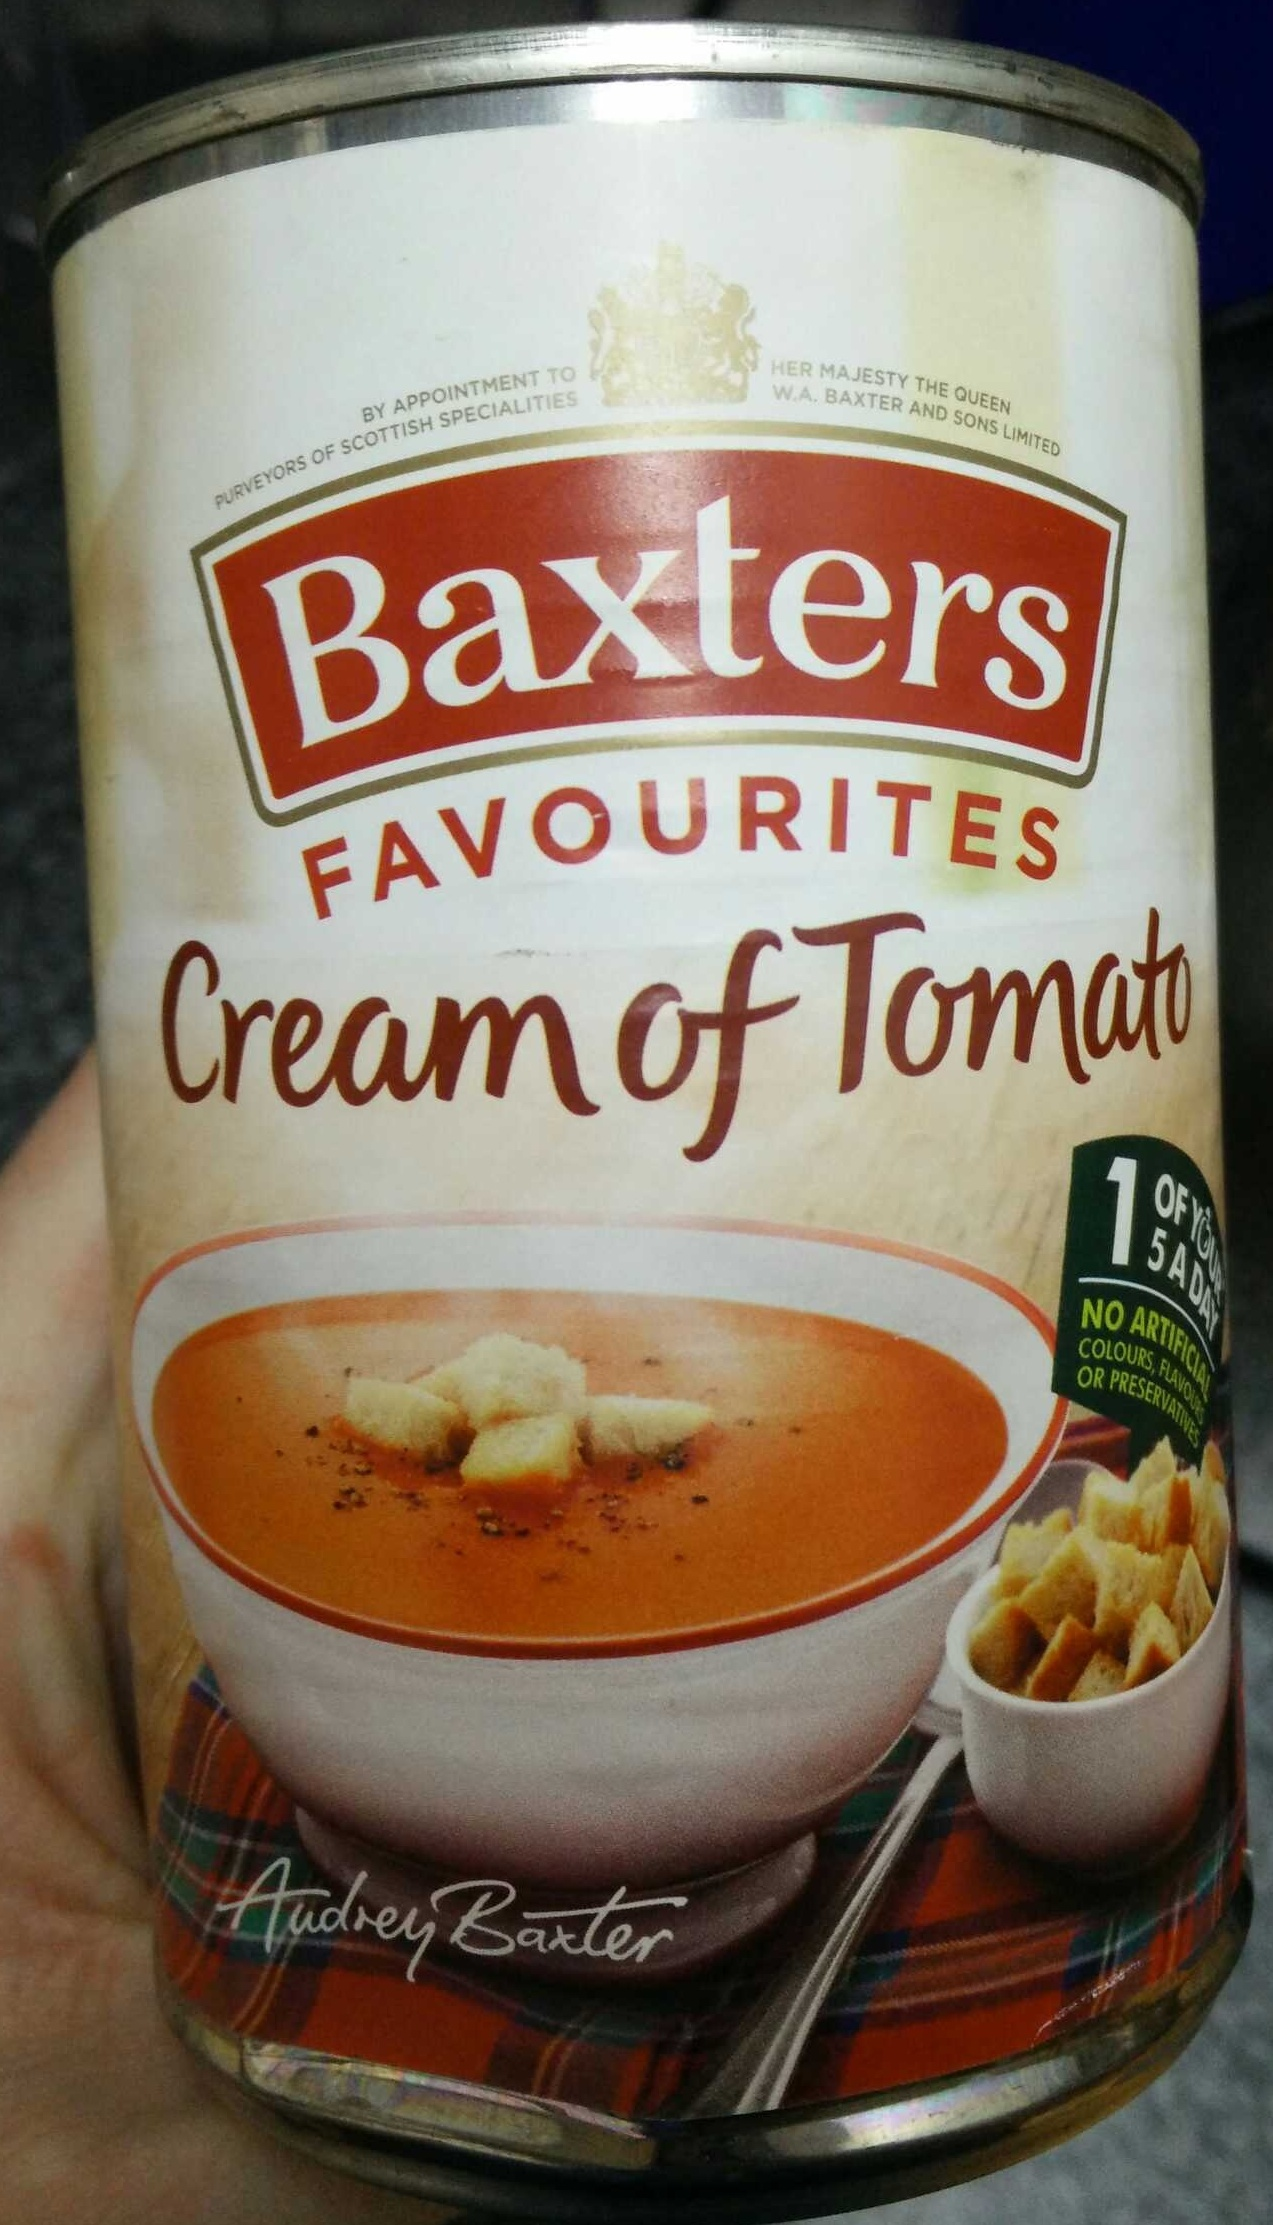 Cream of Tomato - Product